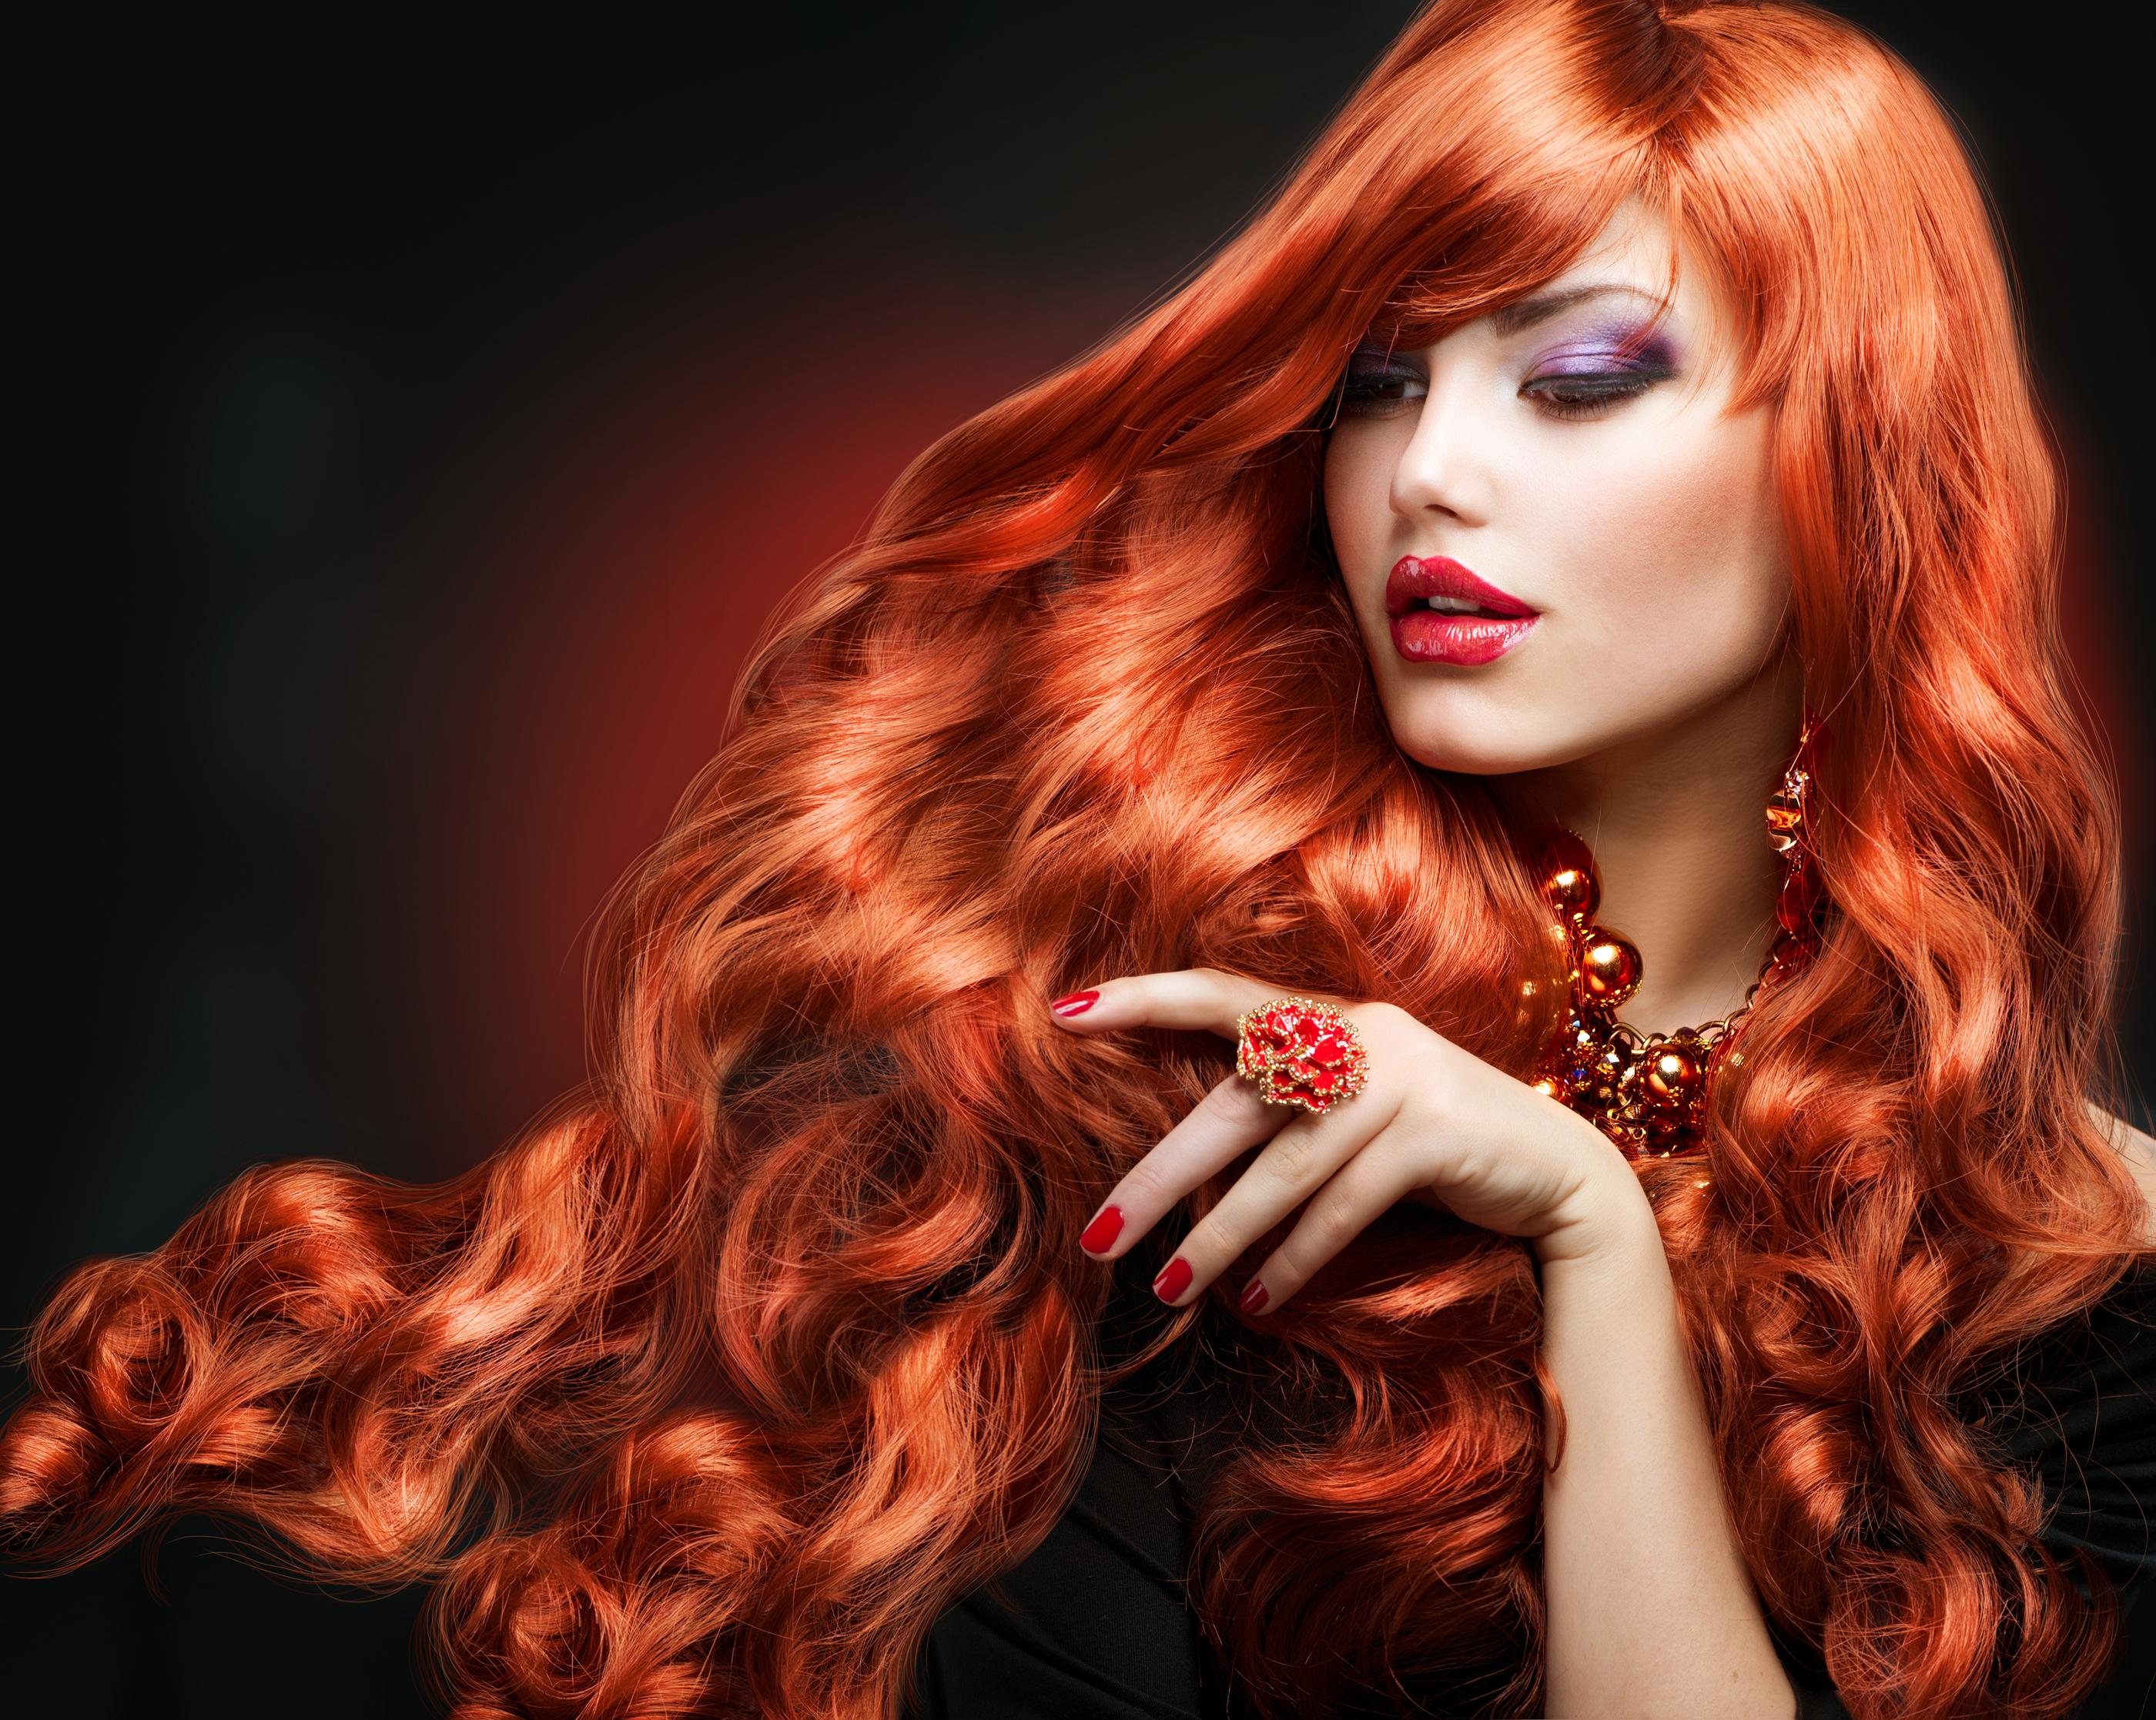 Antropoti-Vip-Club-Concierge-Service-Woman-Hairstyle1